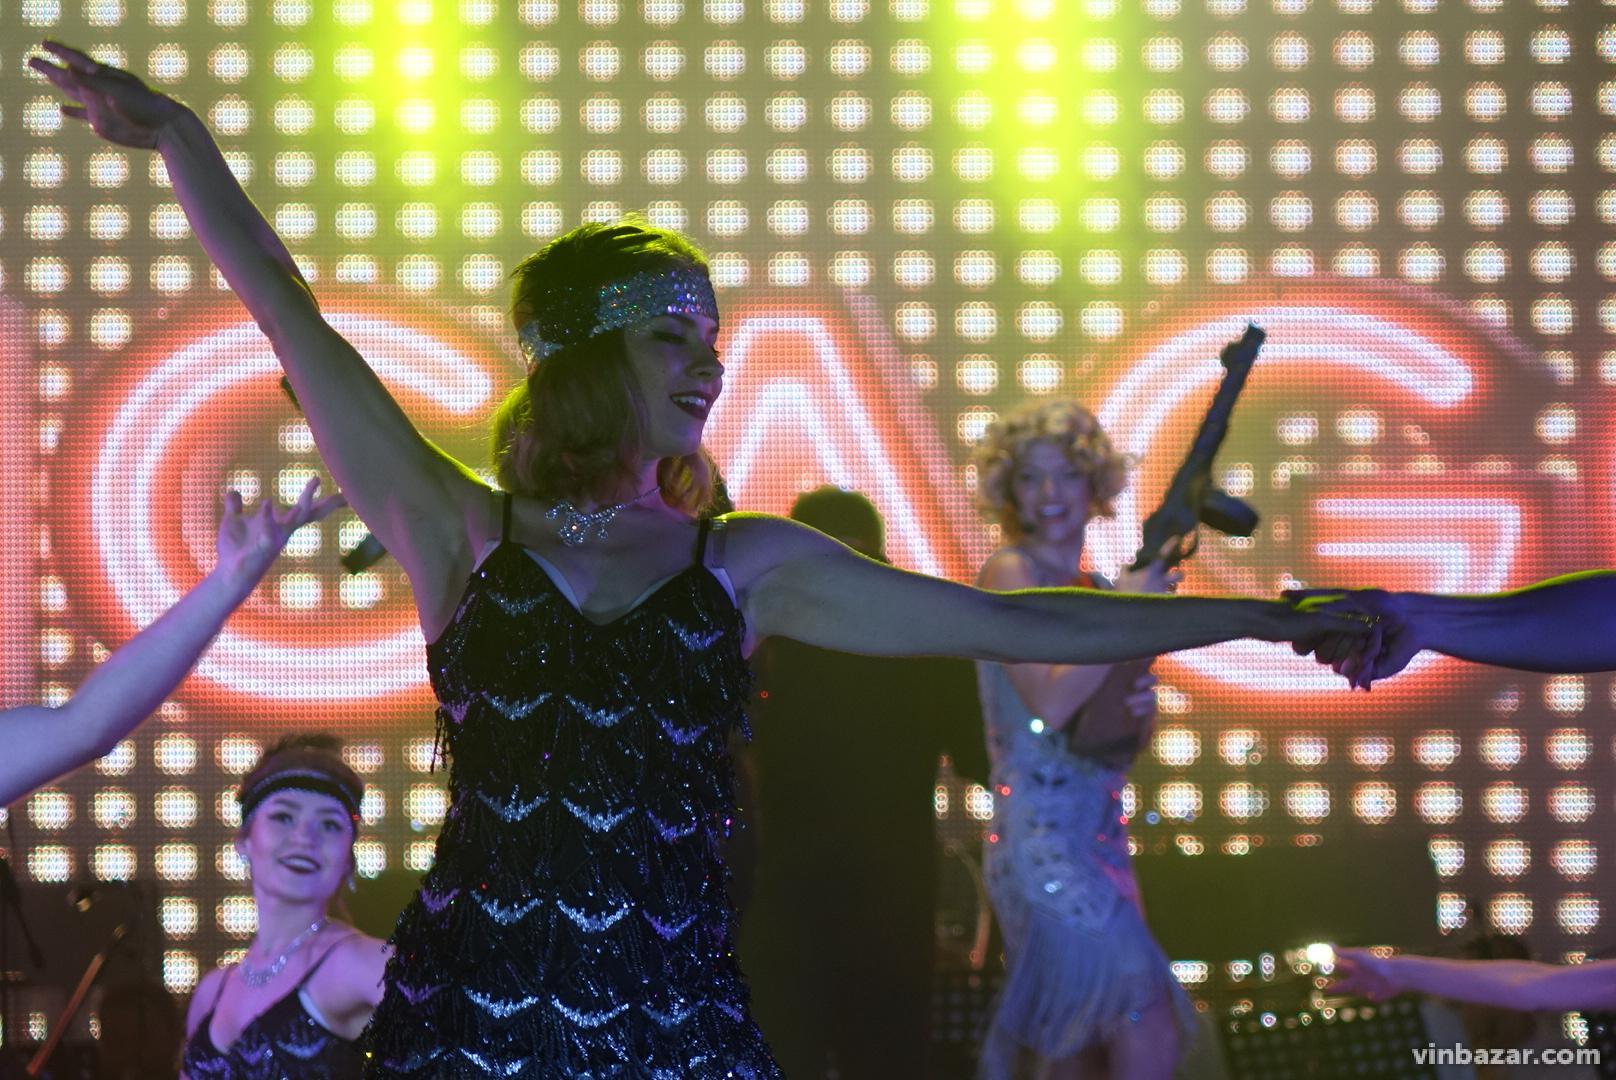 Operafest-Tulchyn 2018 завершили мюзиклом «Чикаго», феєрверком та аншлагом (Фото)